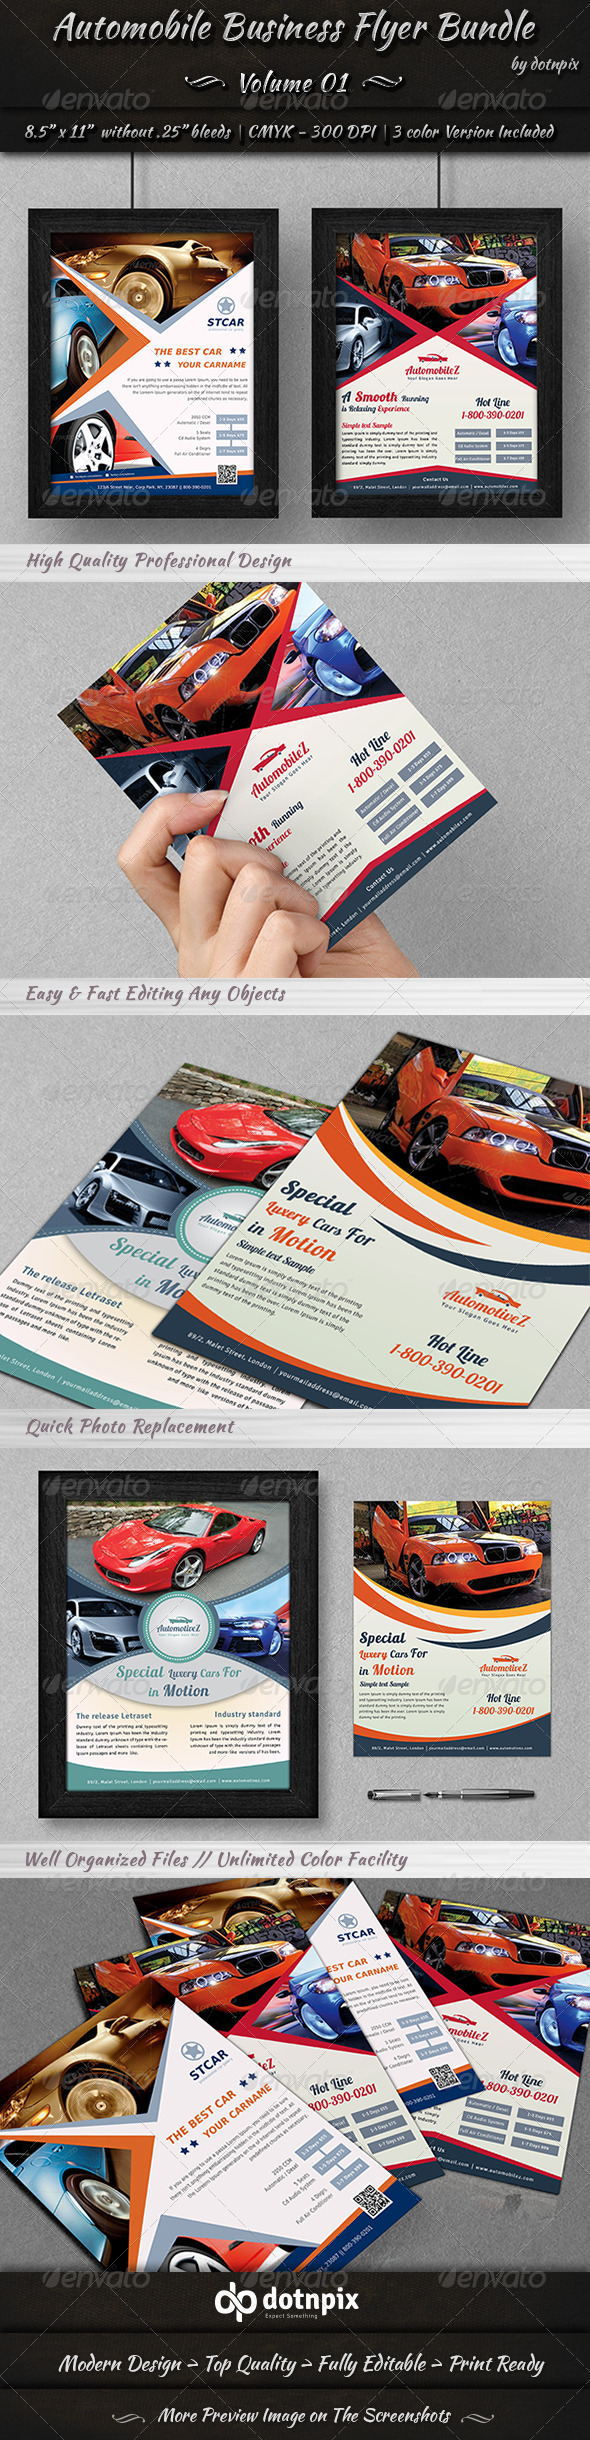 Automobile Business Flyer Bundle | Volume 1 - Corporate Flyers